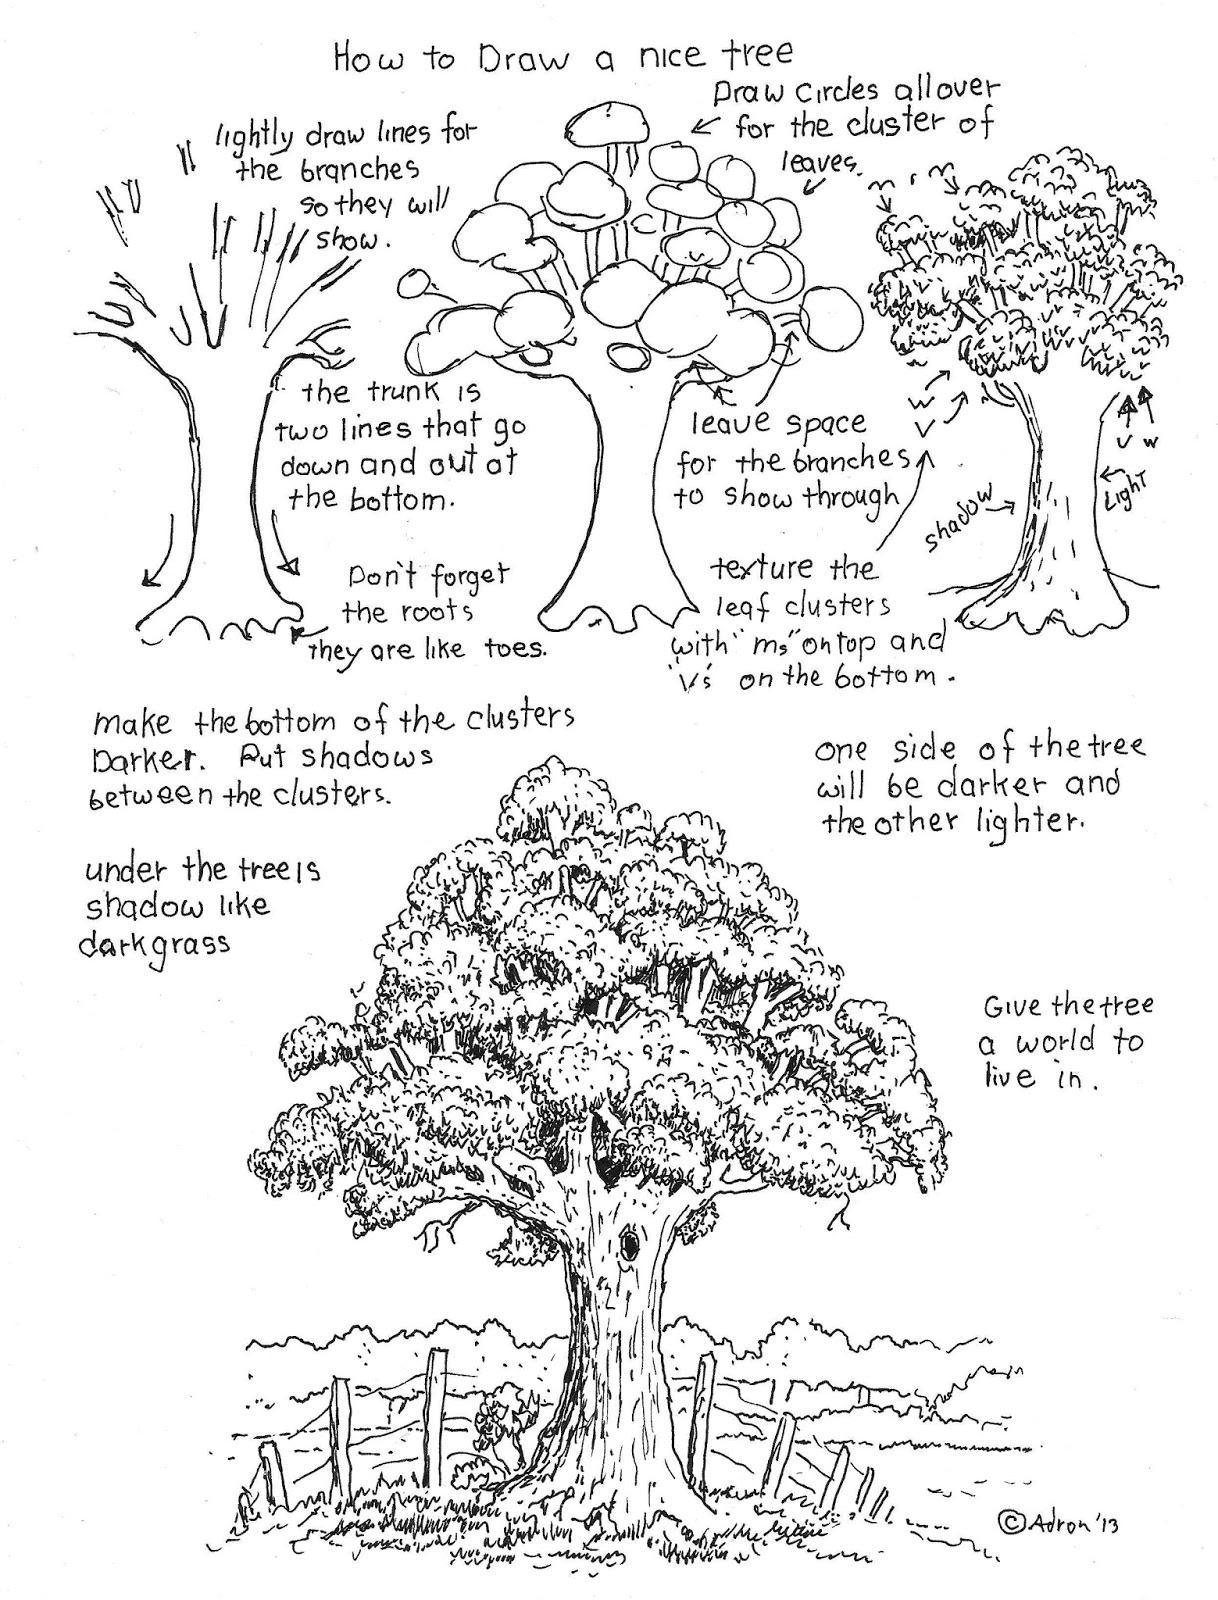 graphic regarding The Giving Tree Printable Worksheets identify The Delivering Tree Printables A wonderful tree worksheet. - Take pleasure in